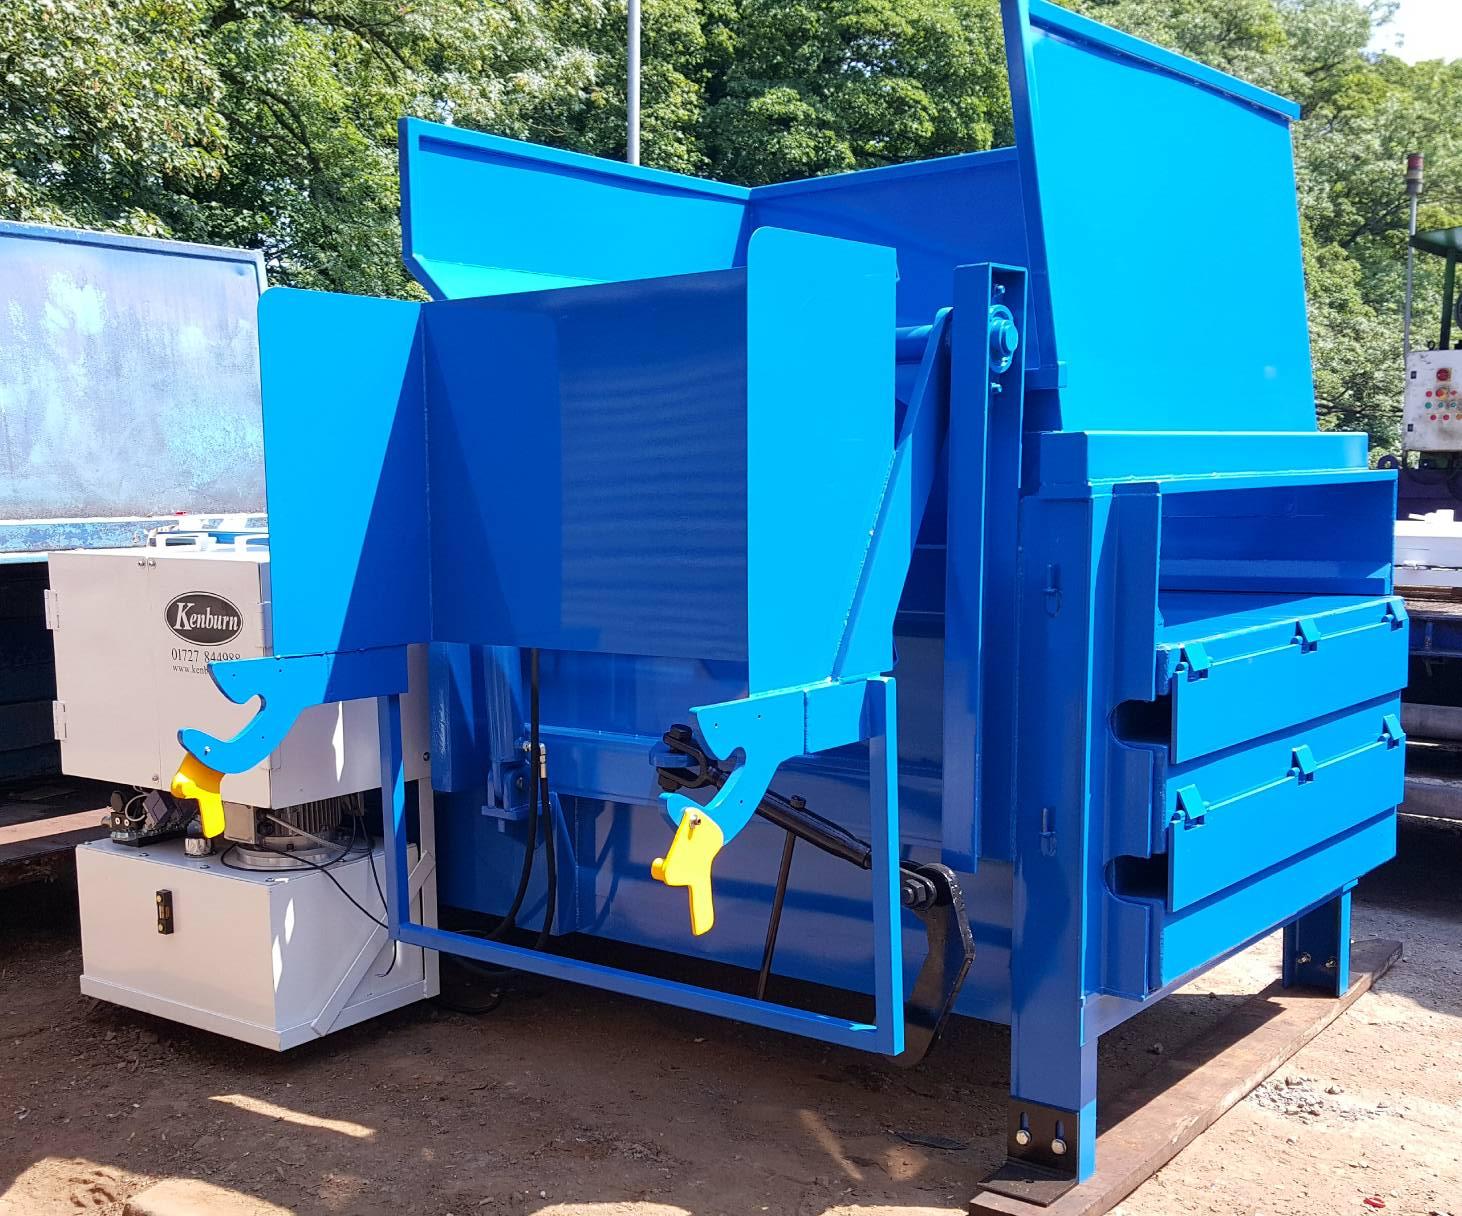 Kenburn Select KS250 Static Compactor with bin lift